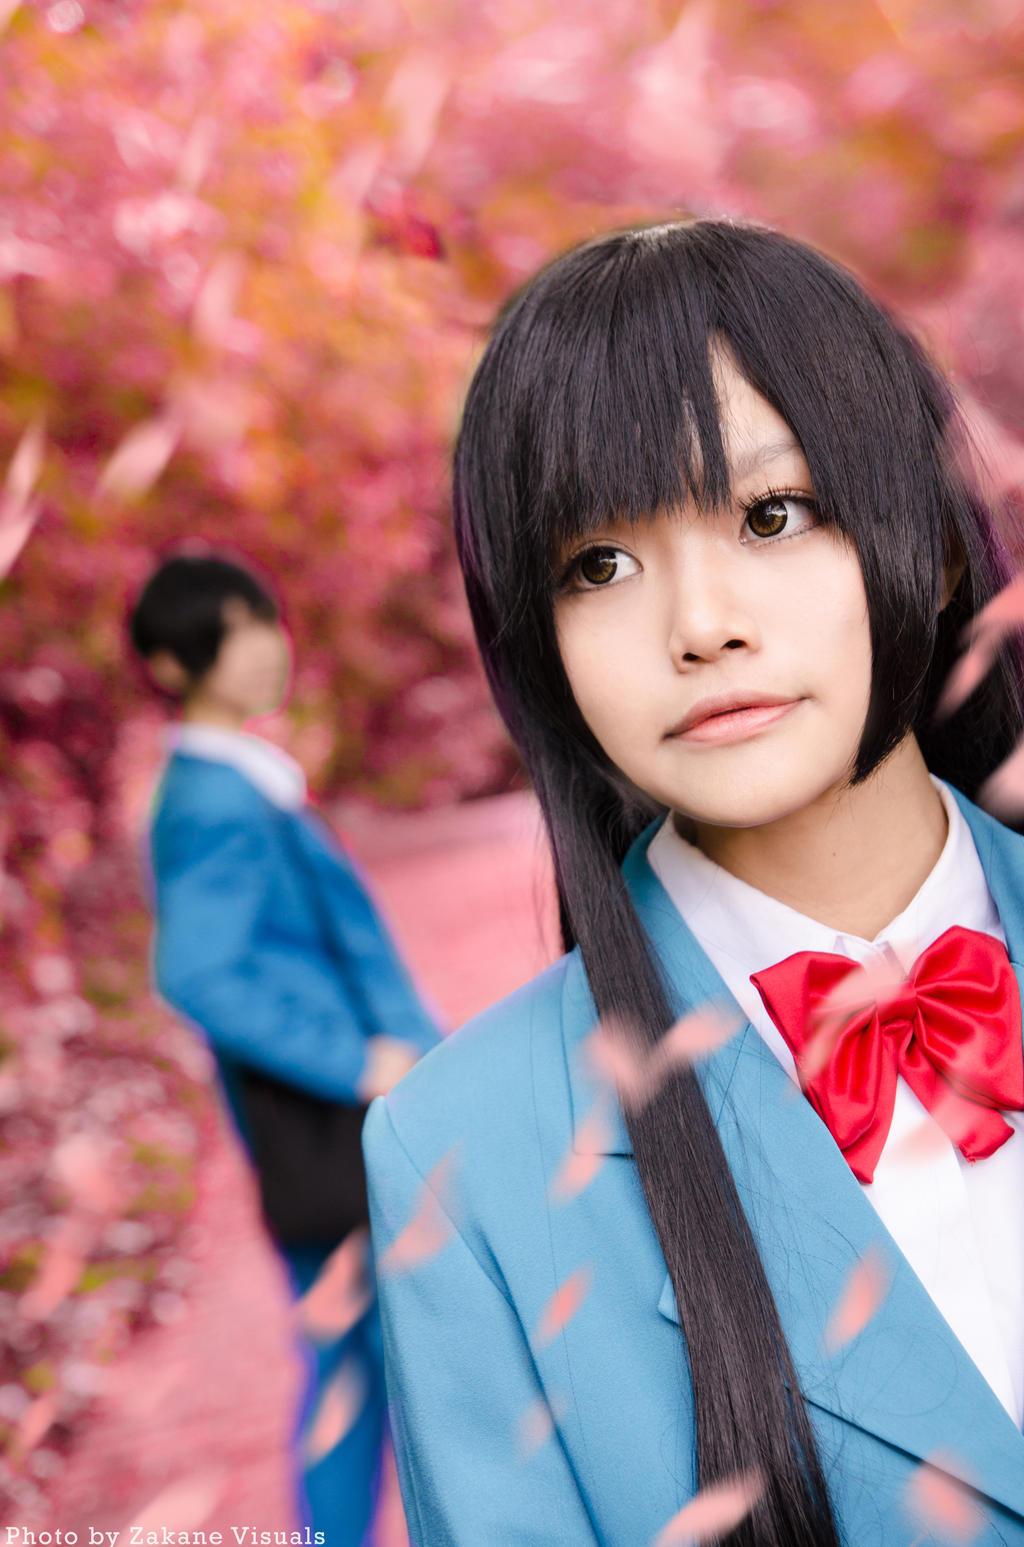 Kimi ni Todoke by Zakane